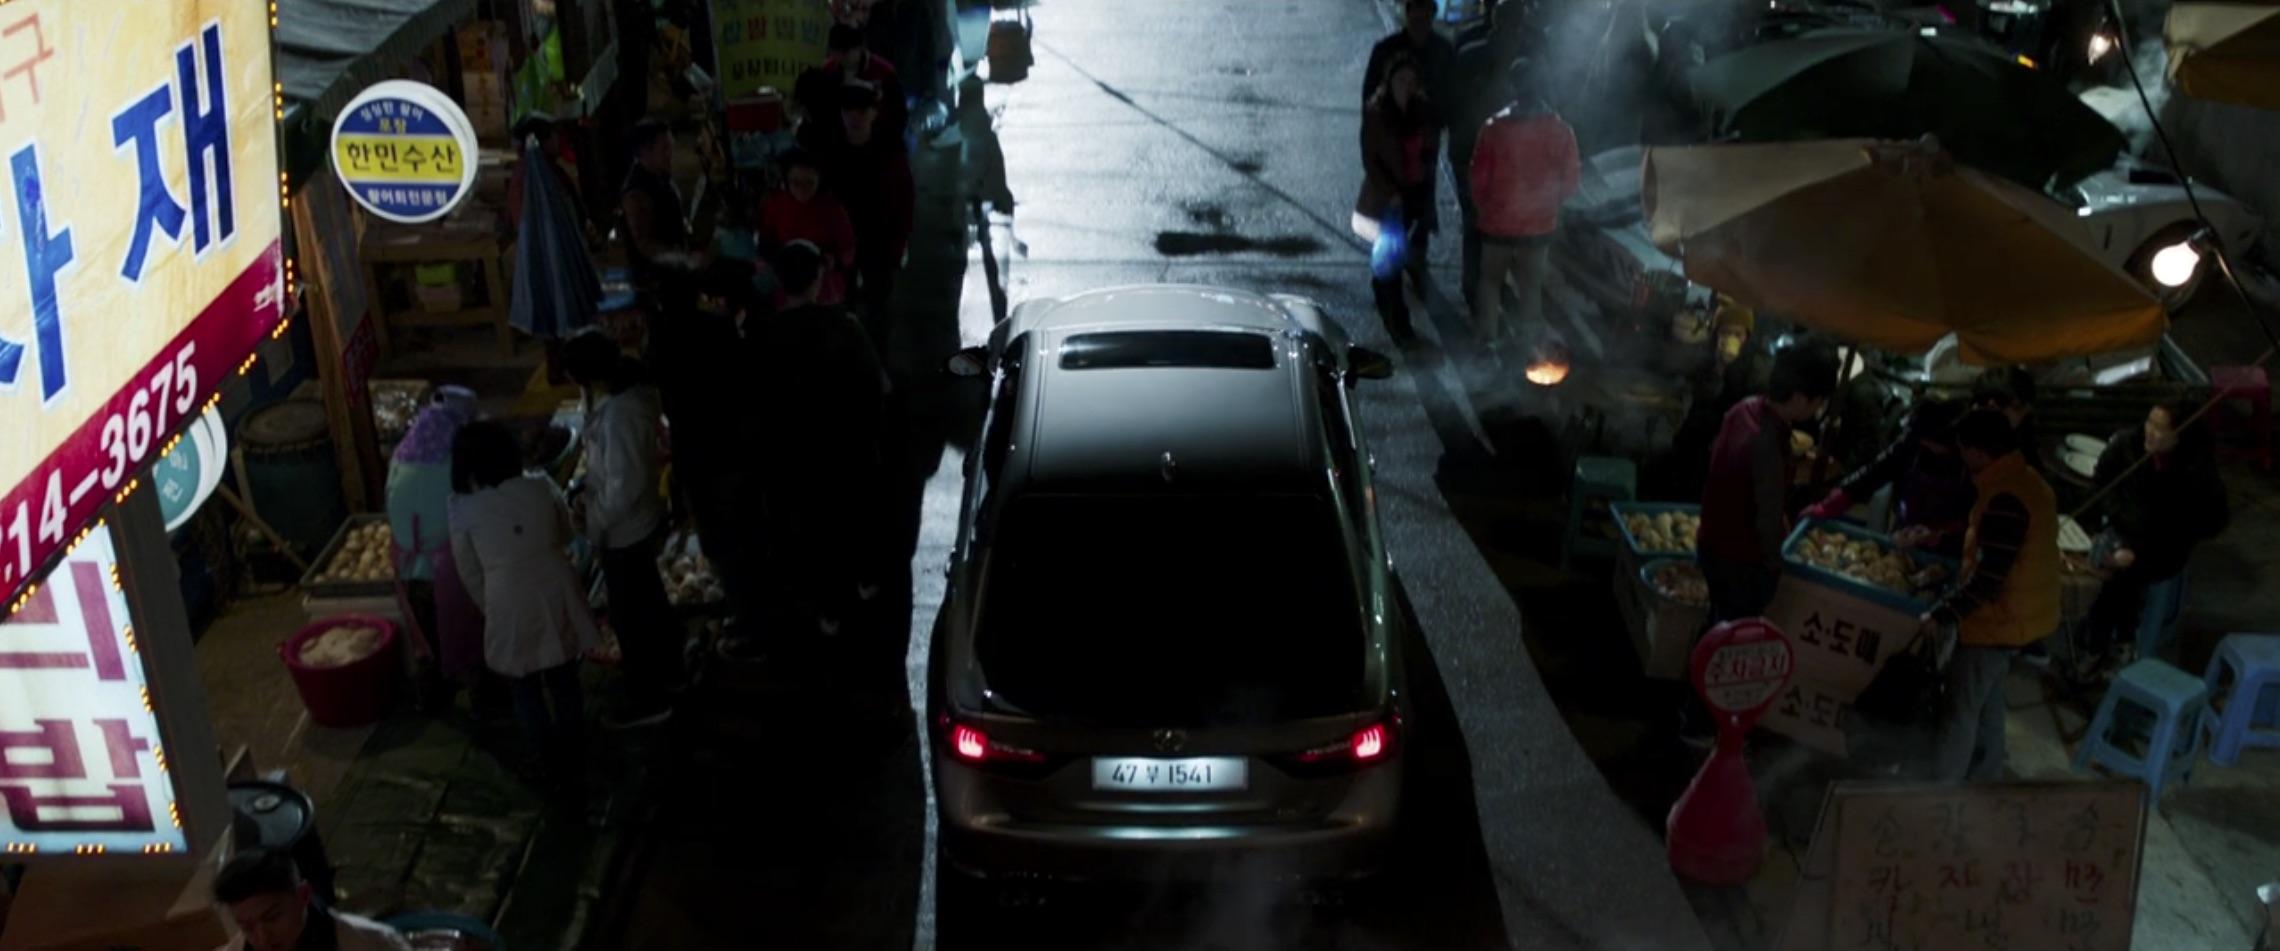 Marvel Black Panther korean street